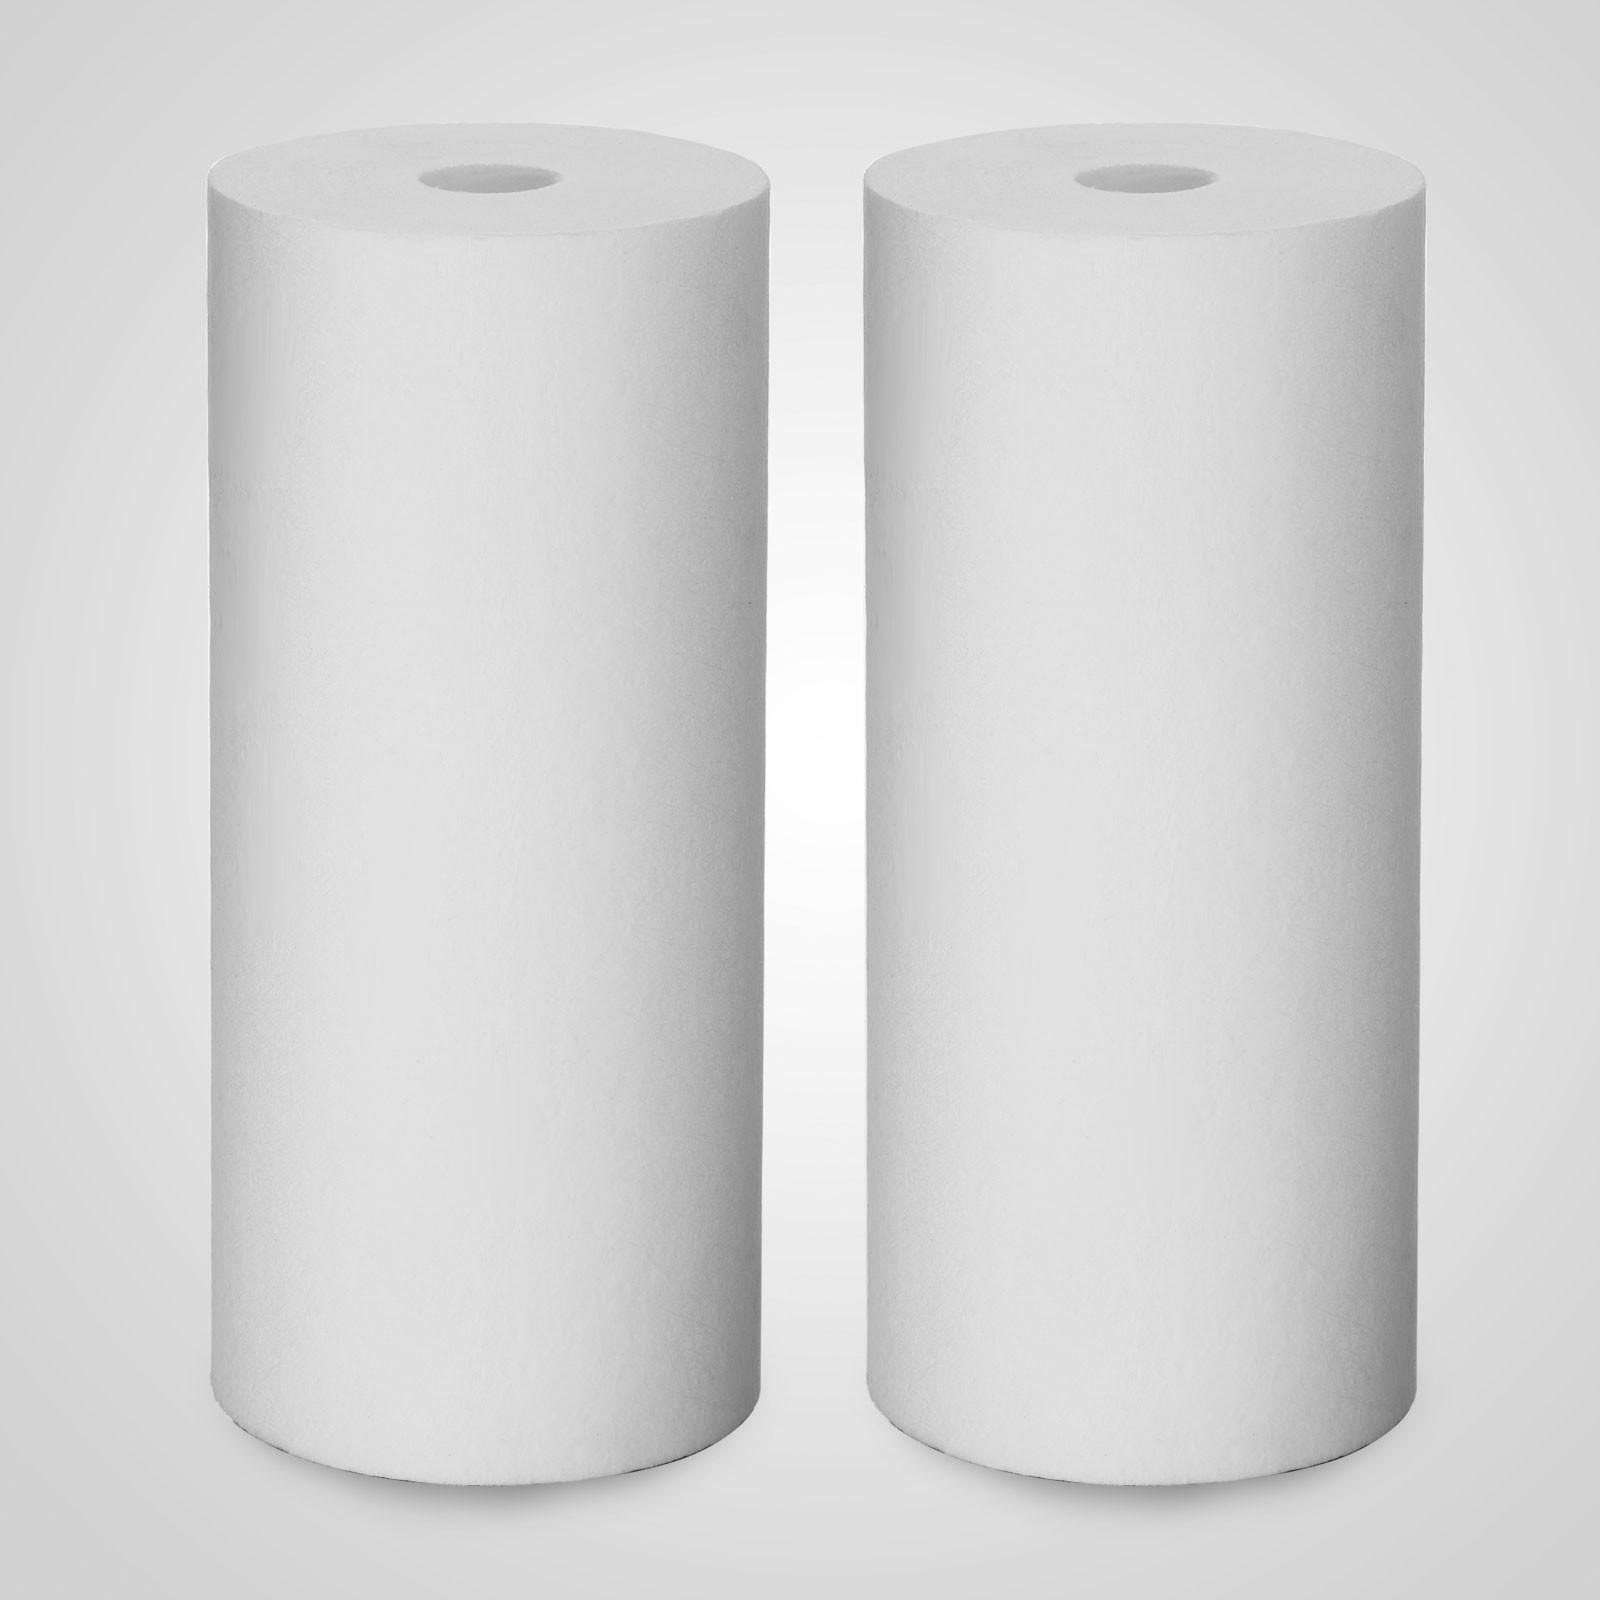 20Pcs-Cartouche-Filtrante-5-Micron-10-034-X-4-5-034-as-Brita-Emballe-Individu-Bobine miniature 11